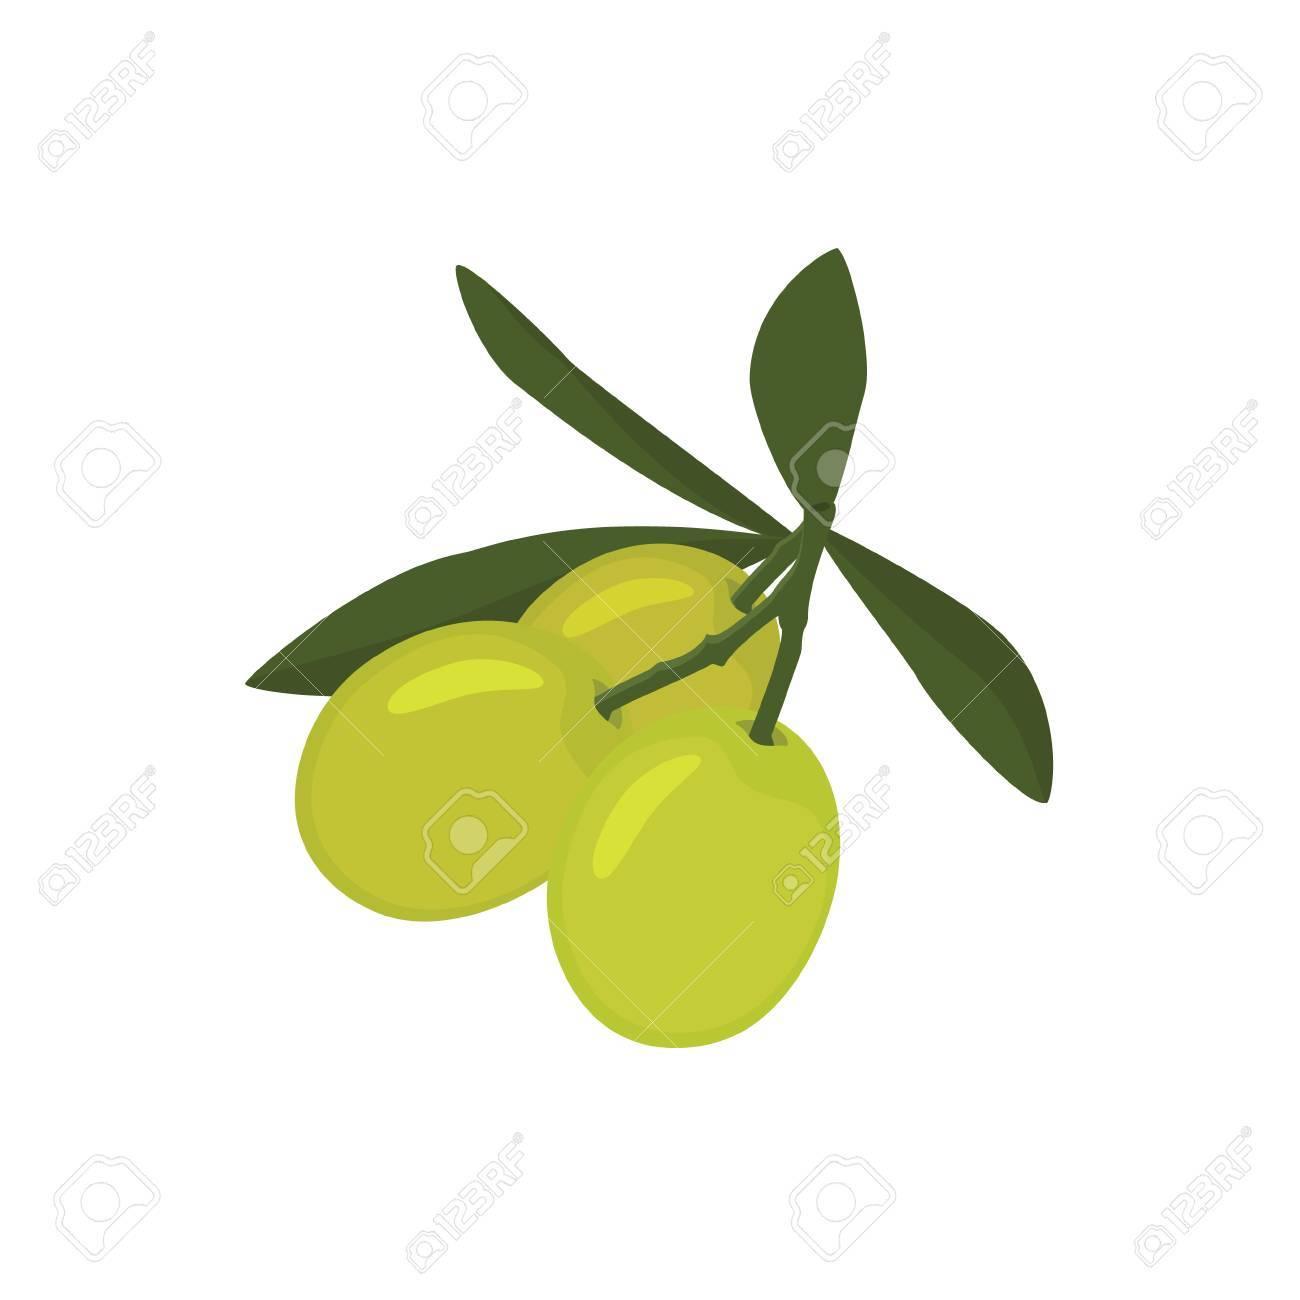 Ilustración Vectorial Rama De Aceitunas Verdes Con Hojas O Cocina ...